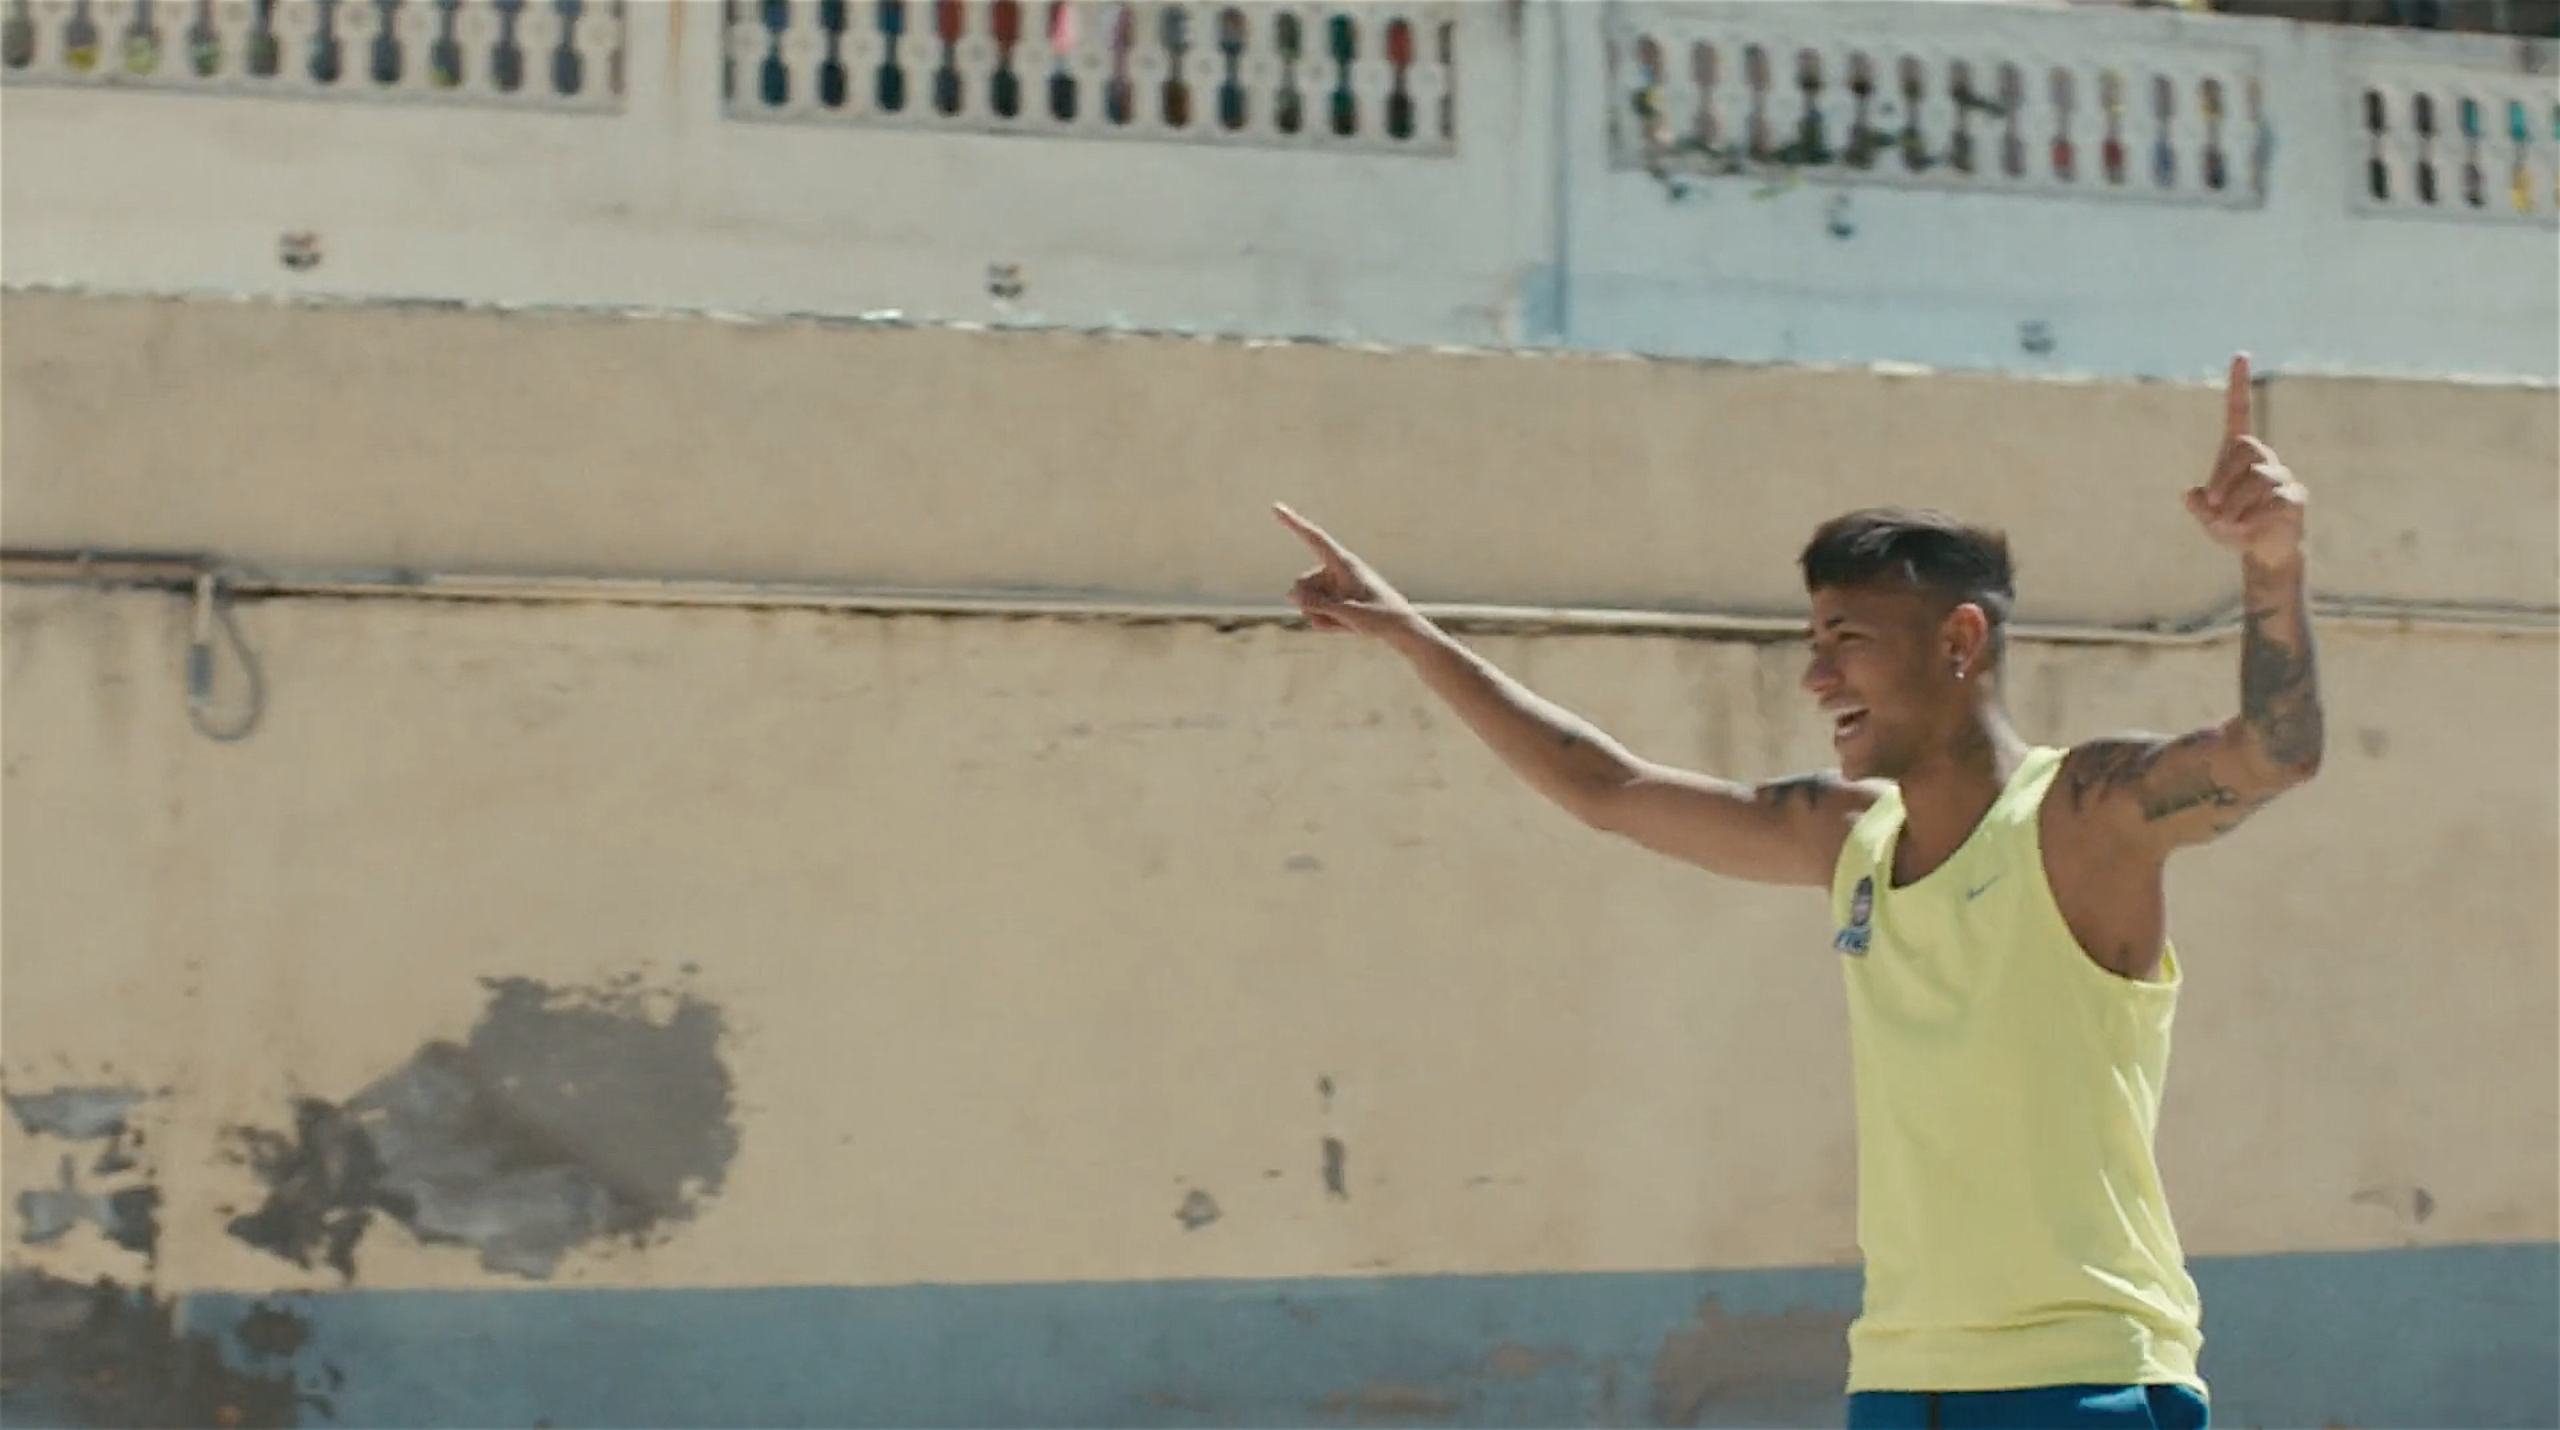 Red Bull x Neymar